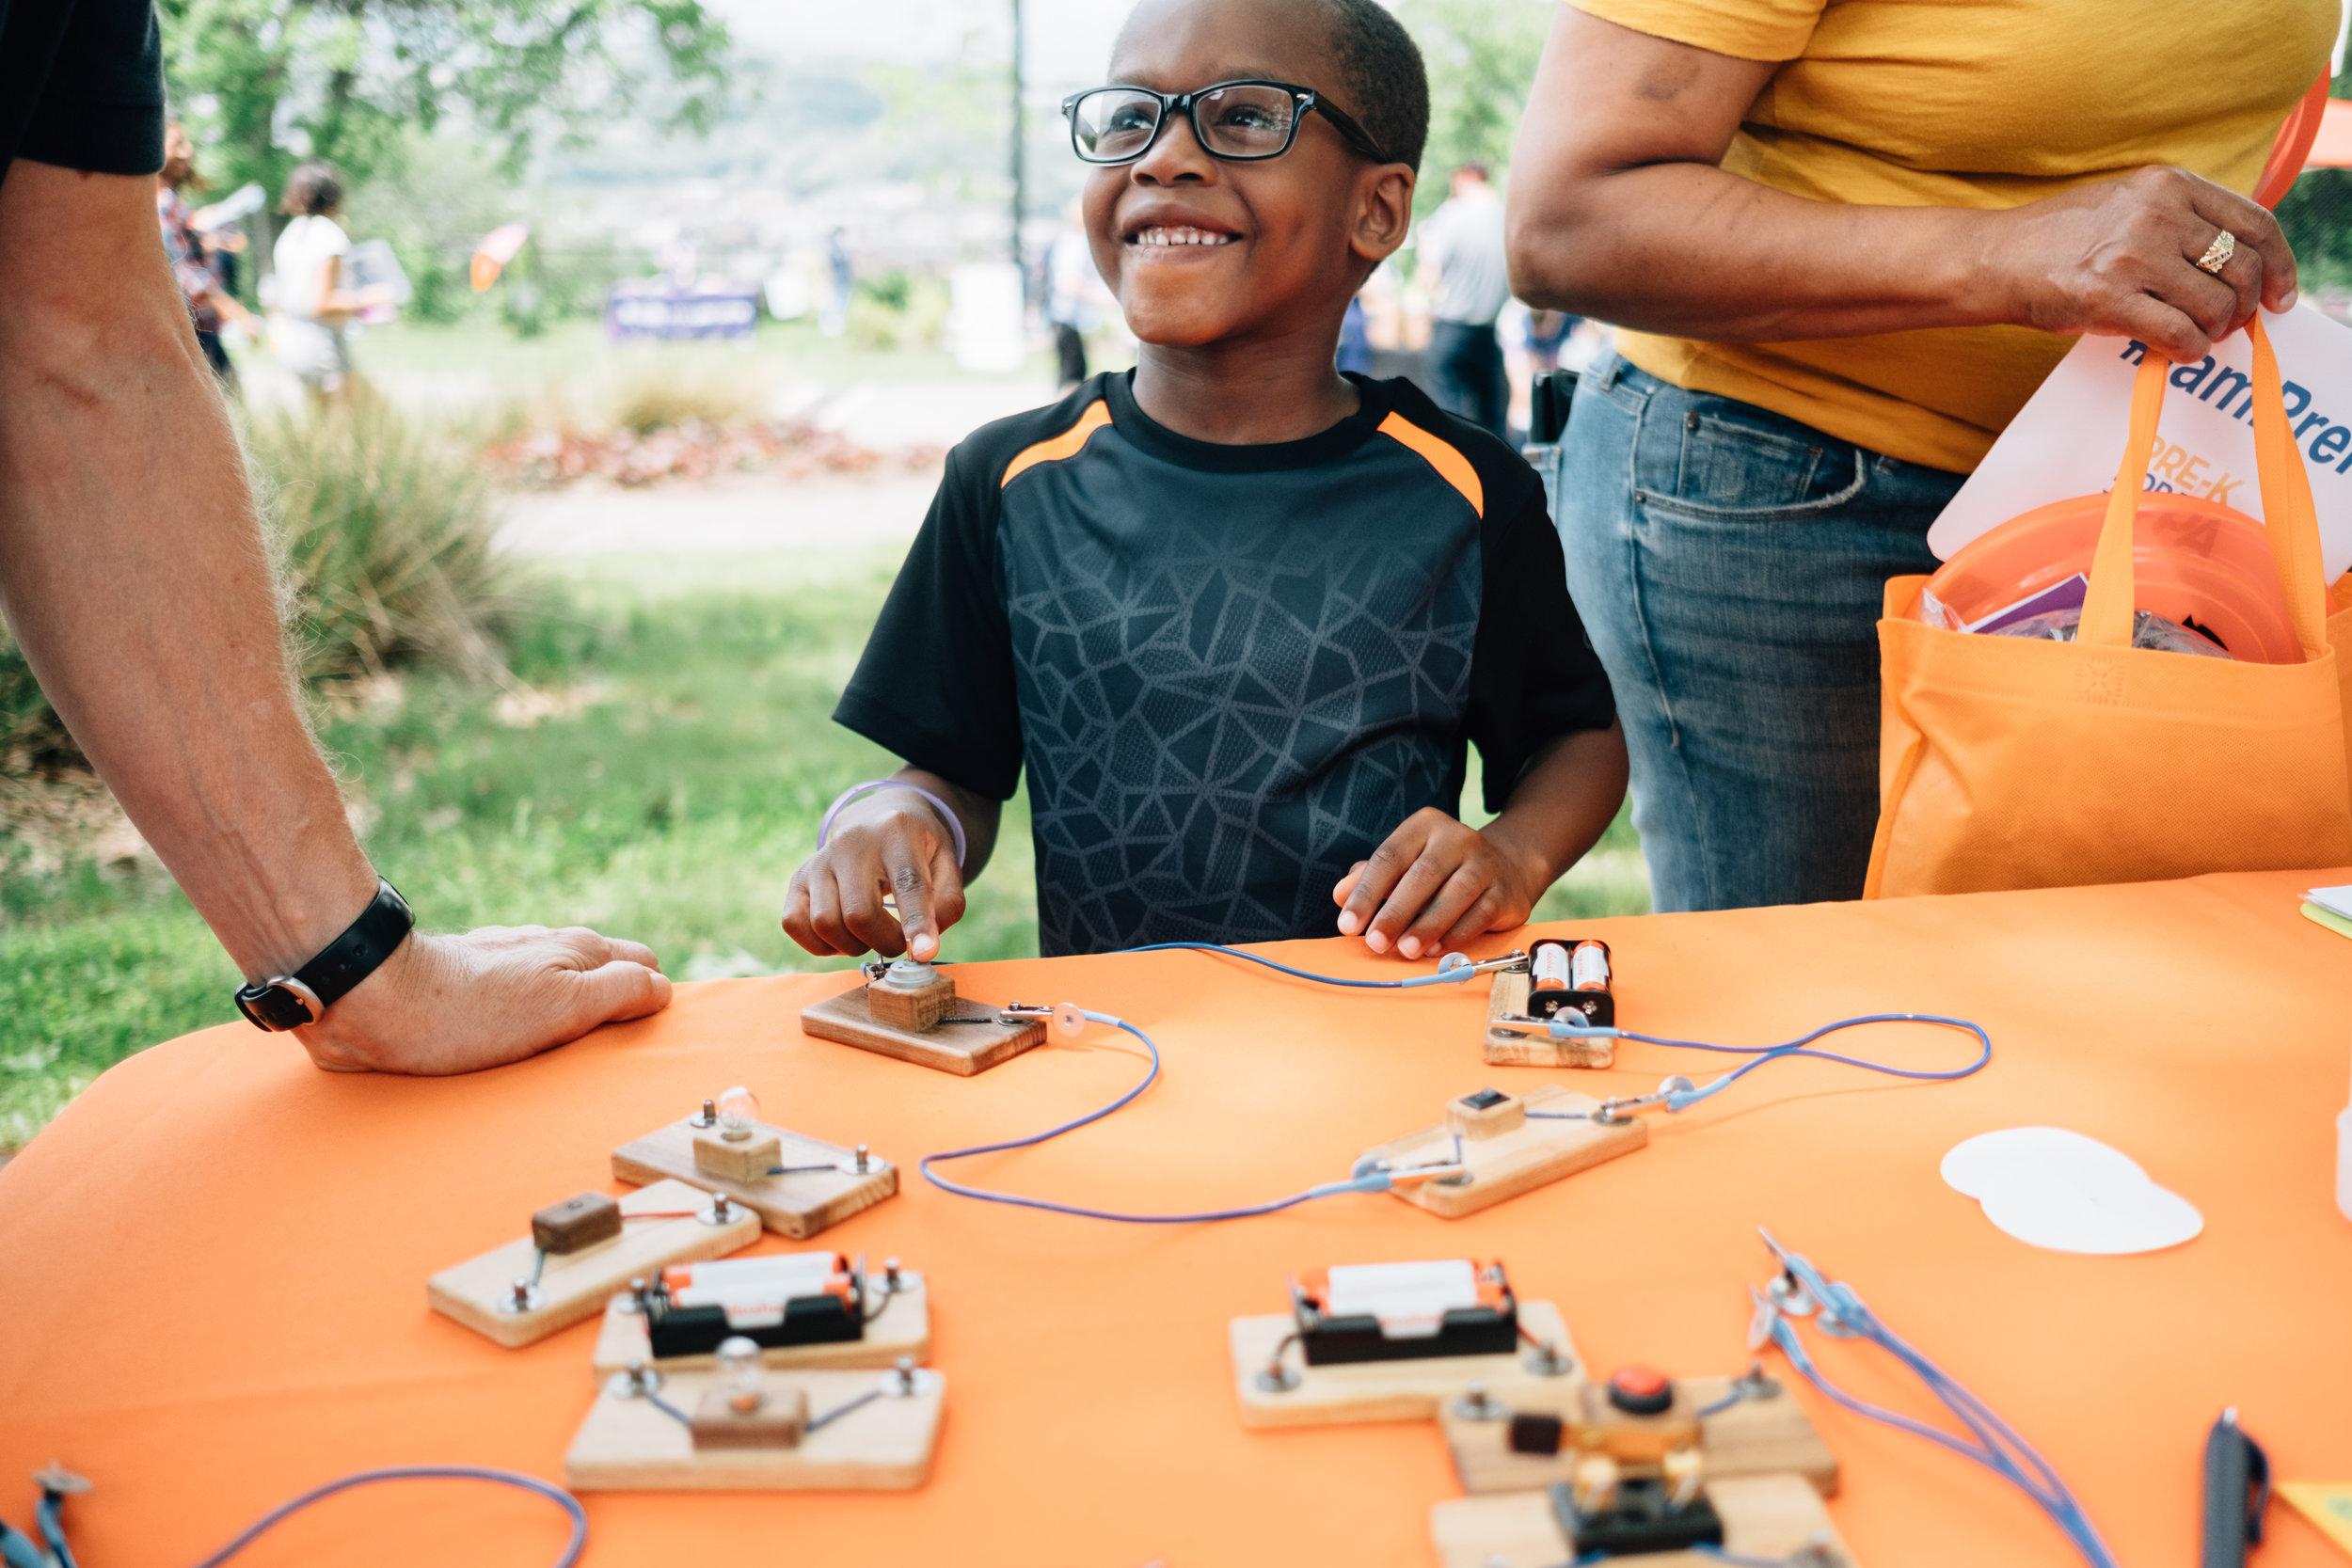 Circuitry with Kidsburgh